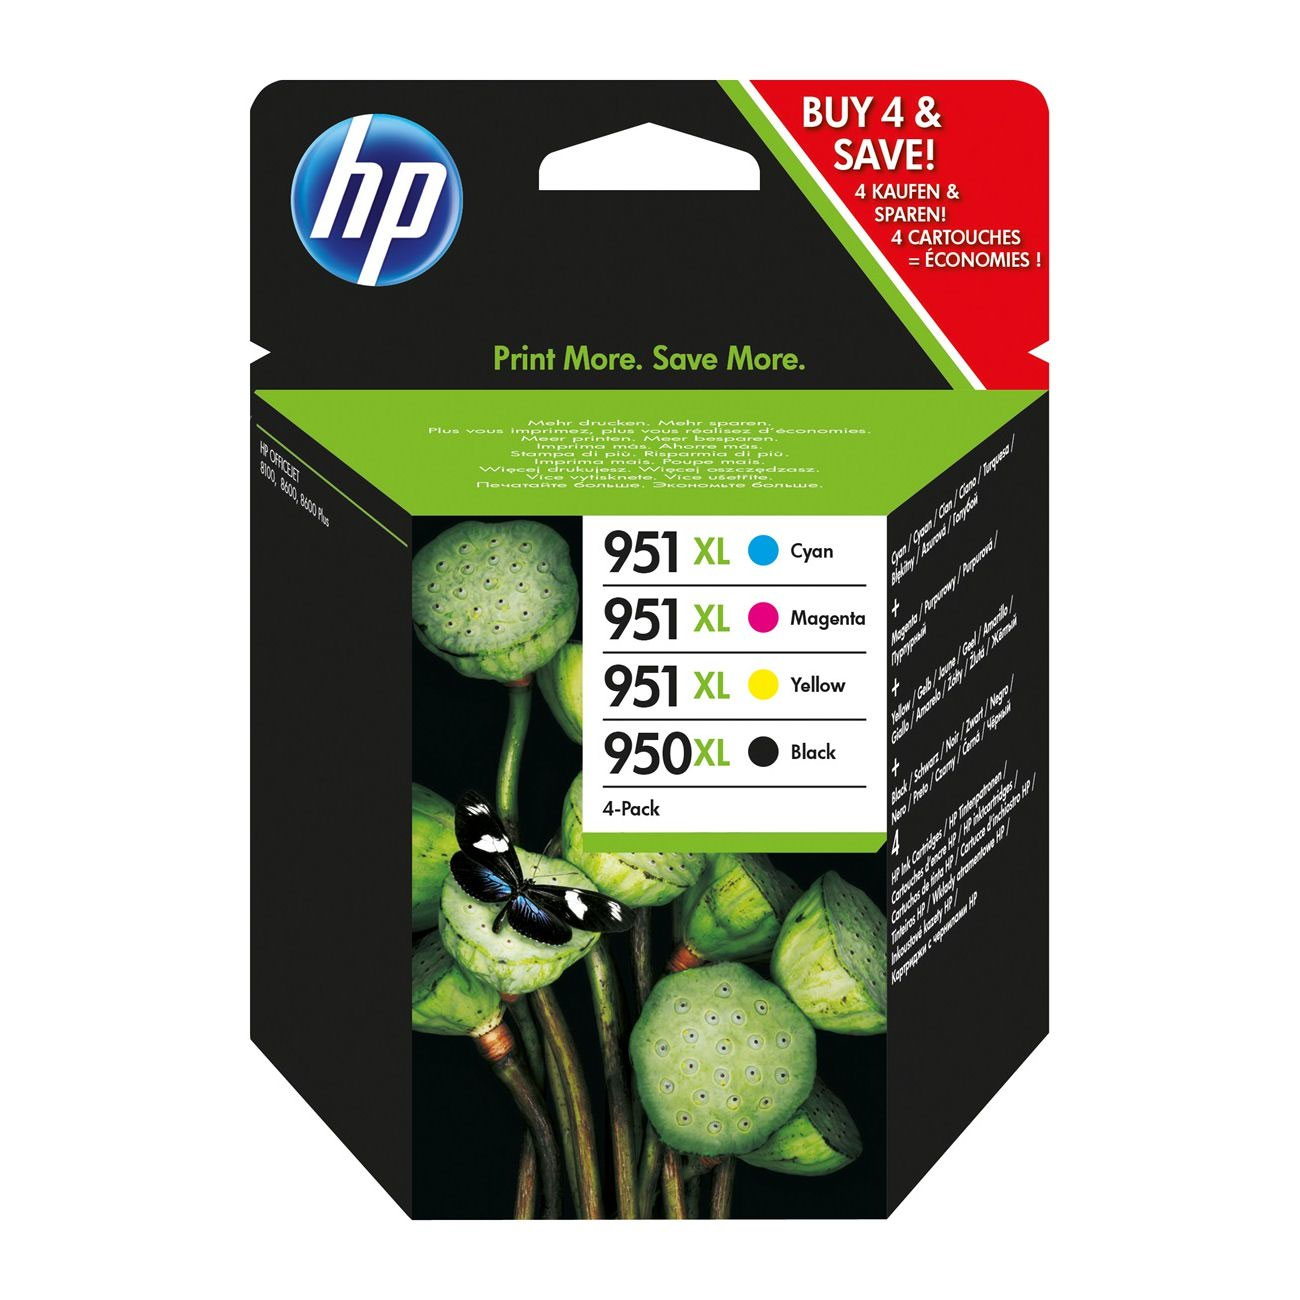 HP No.950XL Inkjet Cartridge High Capacity Black/Cyan/Magenta/Yellow Value Pack C2P43AE